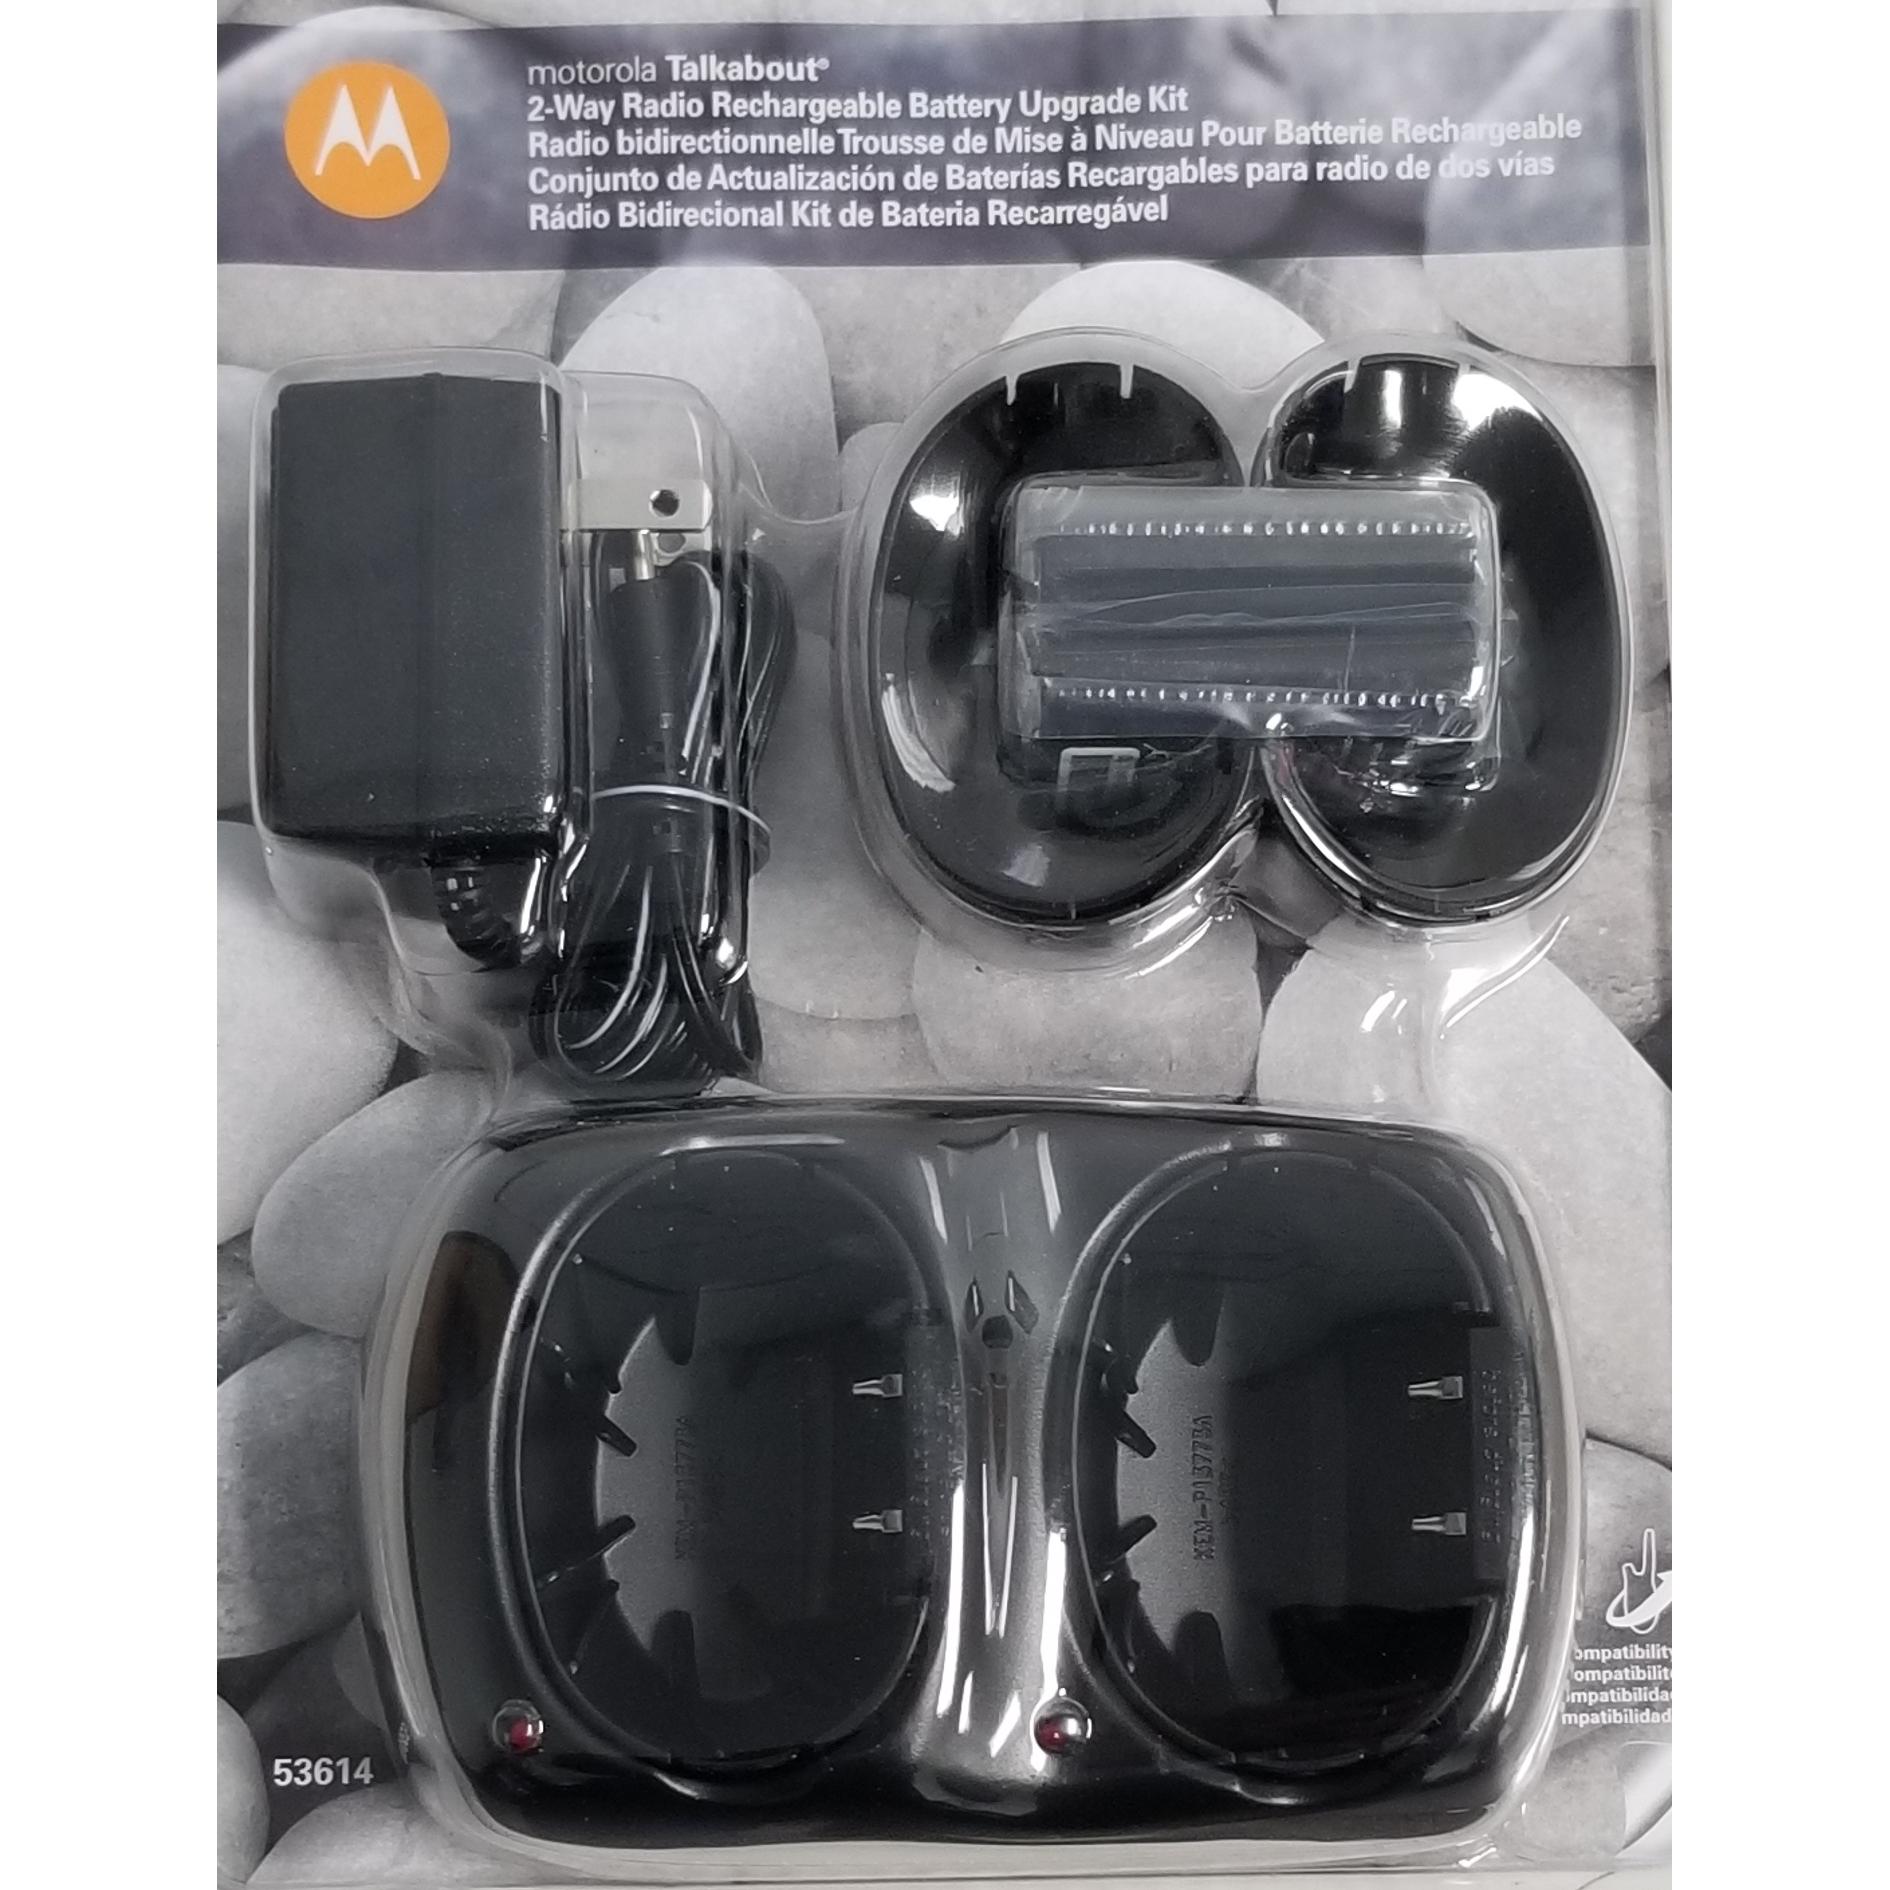 53614 - Motorola Nimh Recharge Battery Charger Upgrade Kit